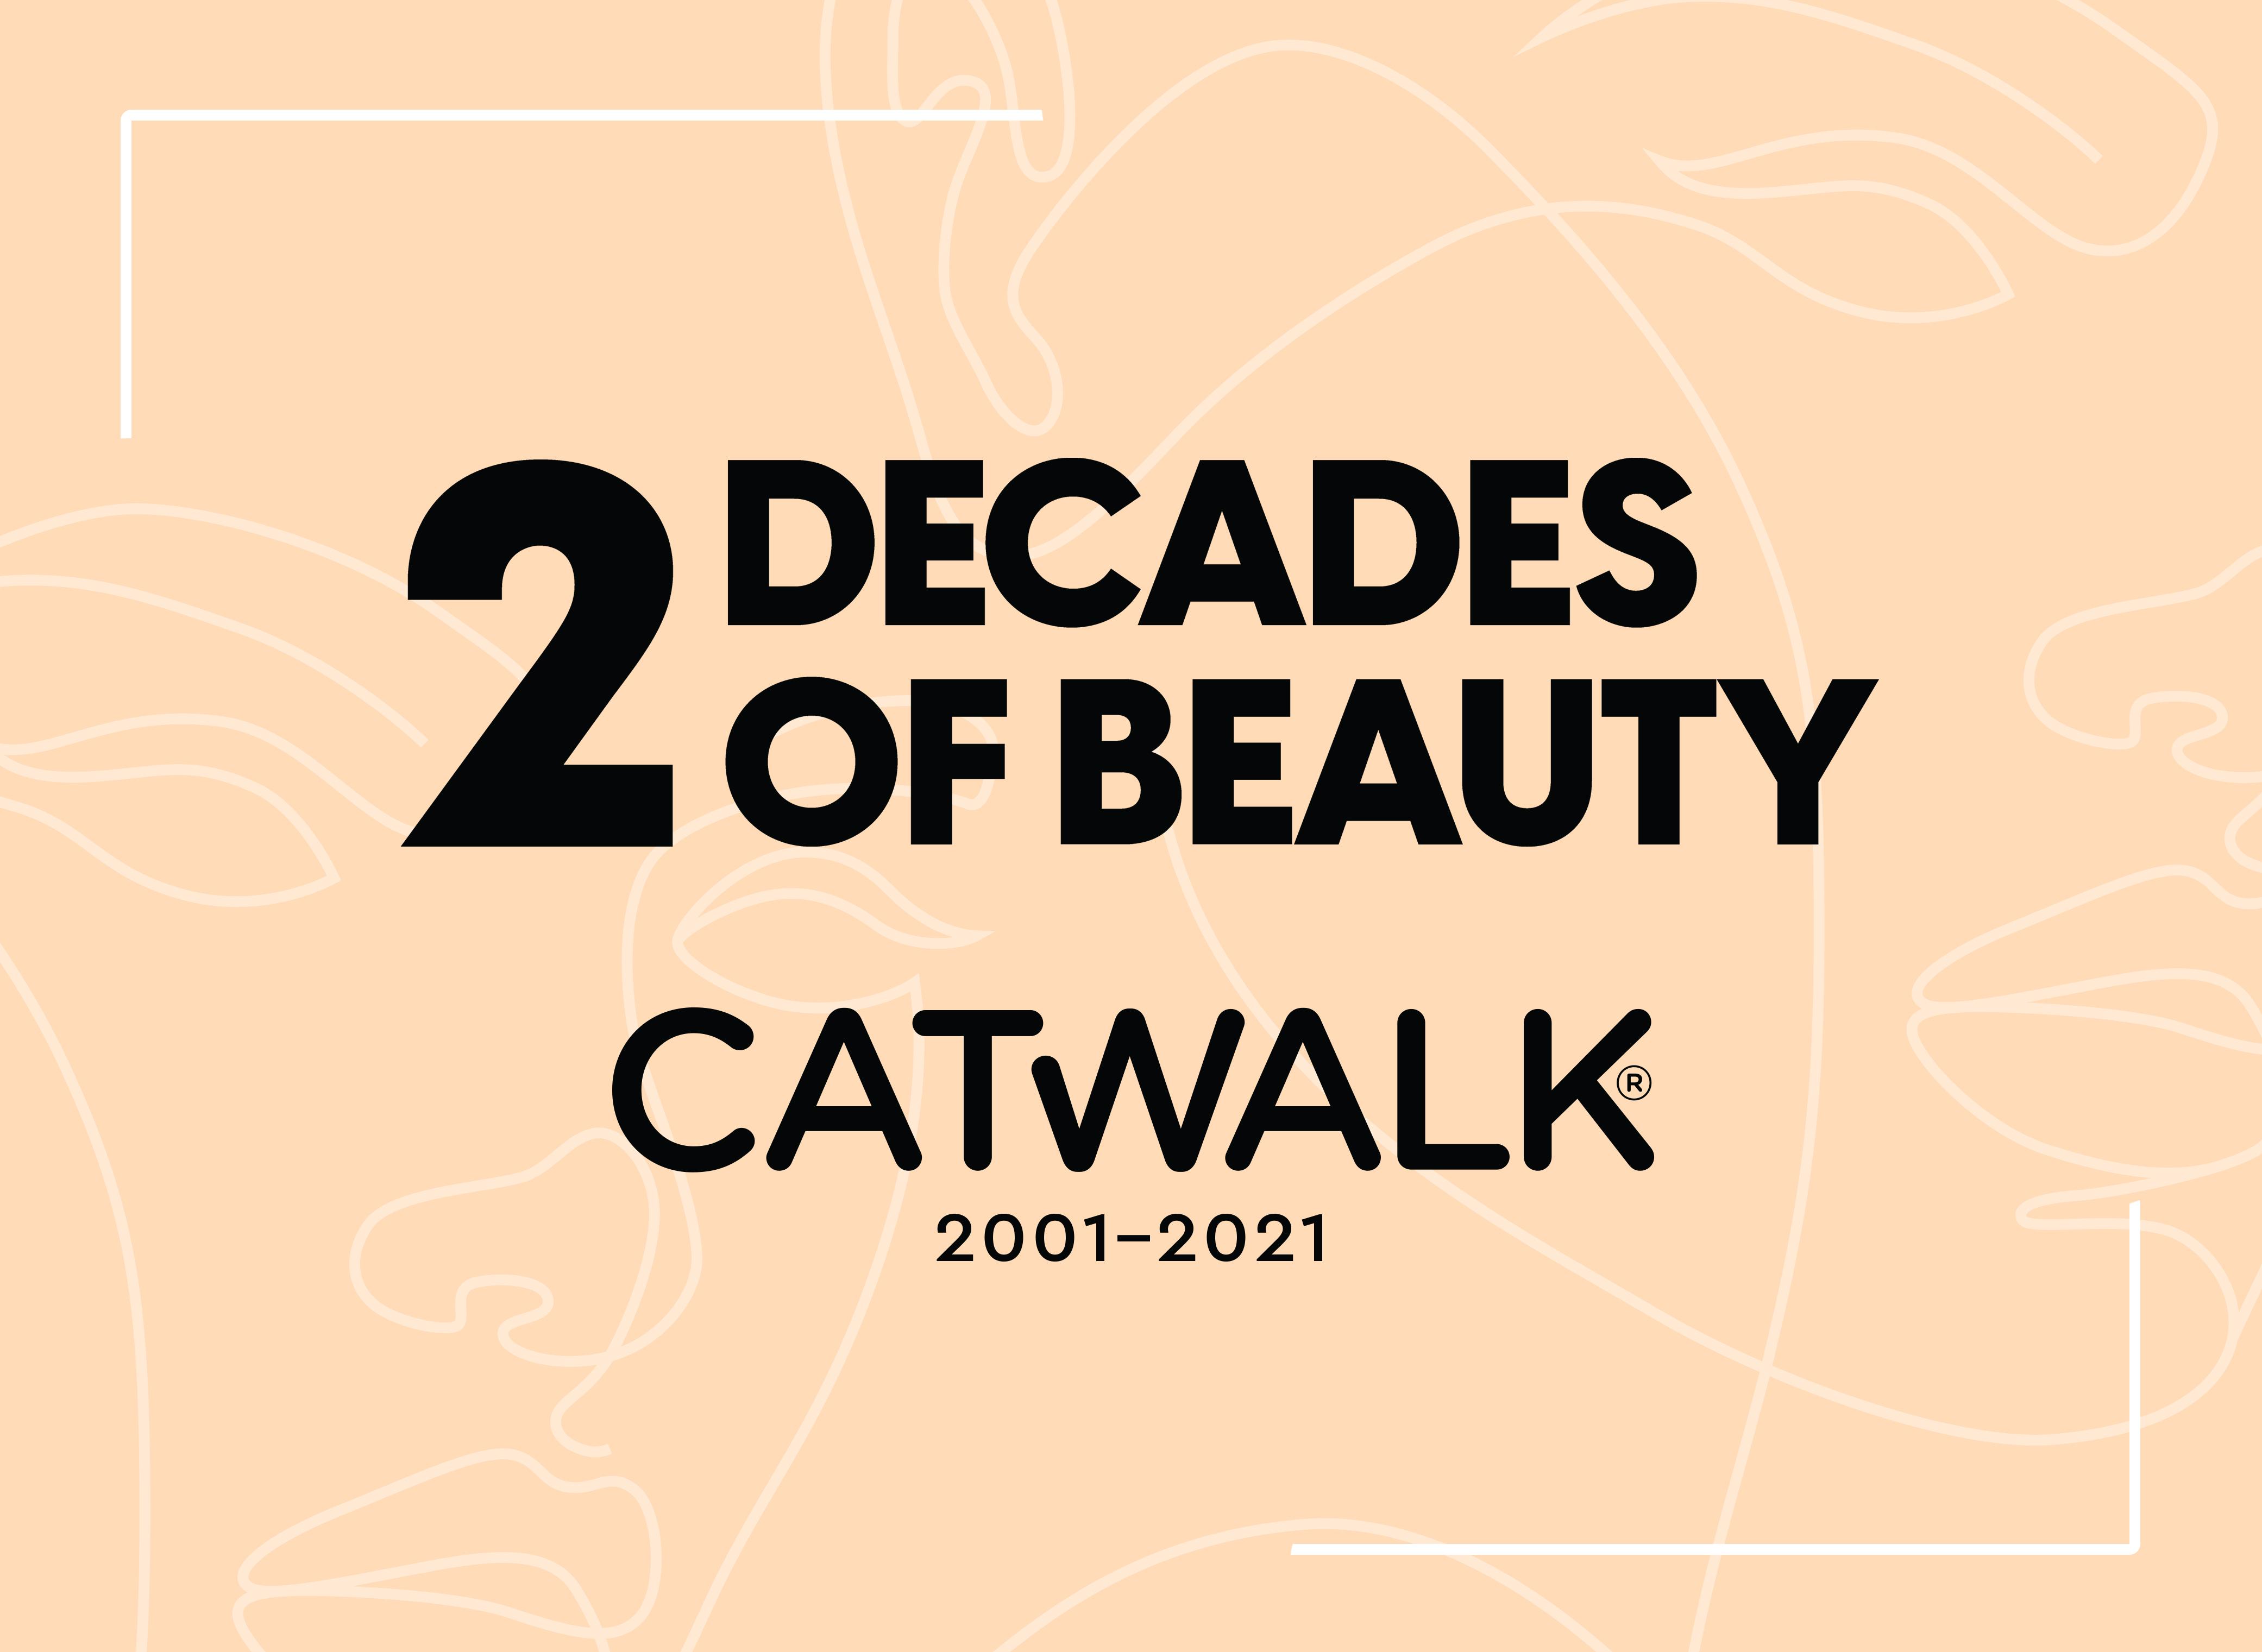 Catwalk 20th Anniversary - Celebrating 2 Decades of Beauty